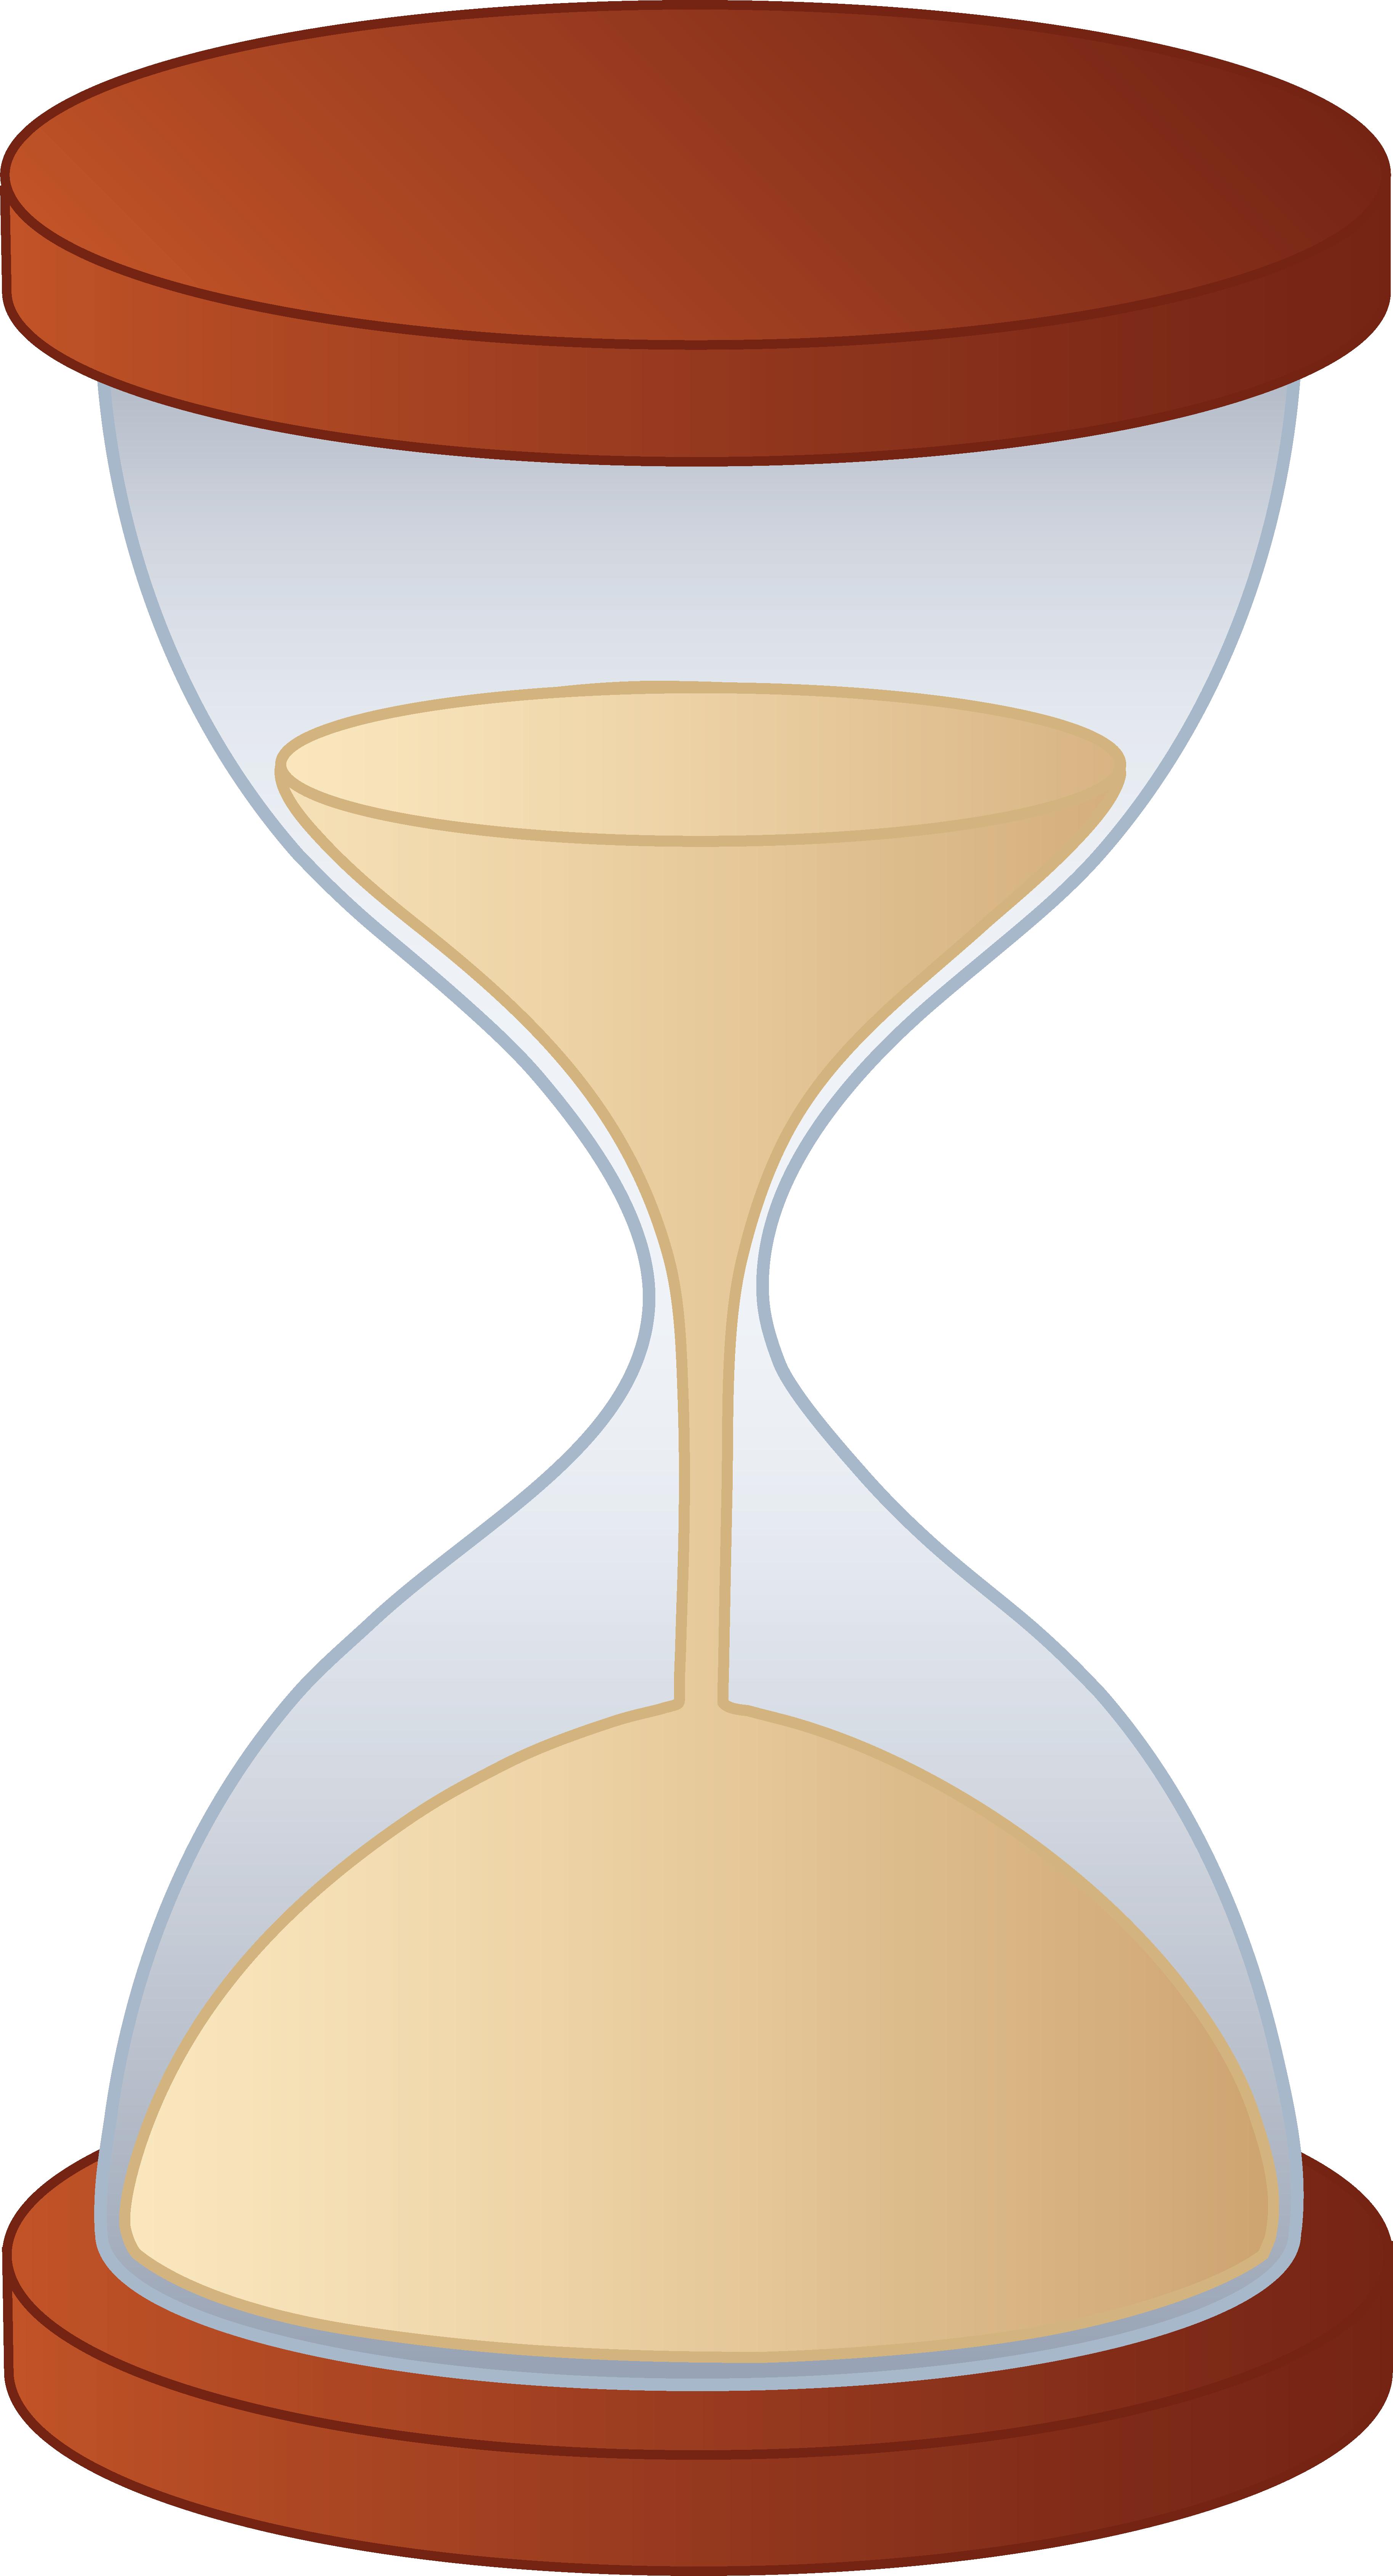 Sand Clock Clipart - ClipArt Best